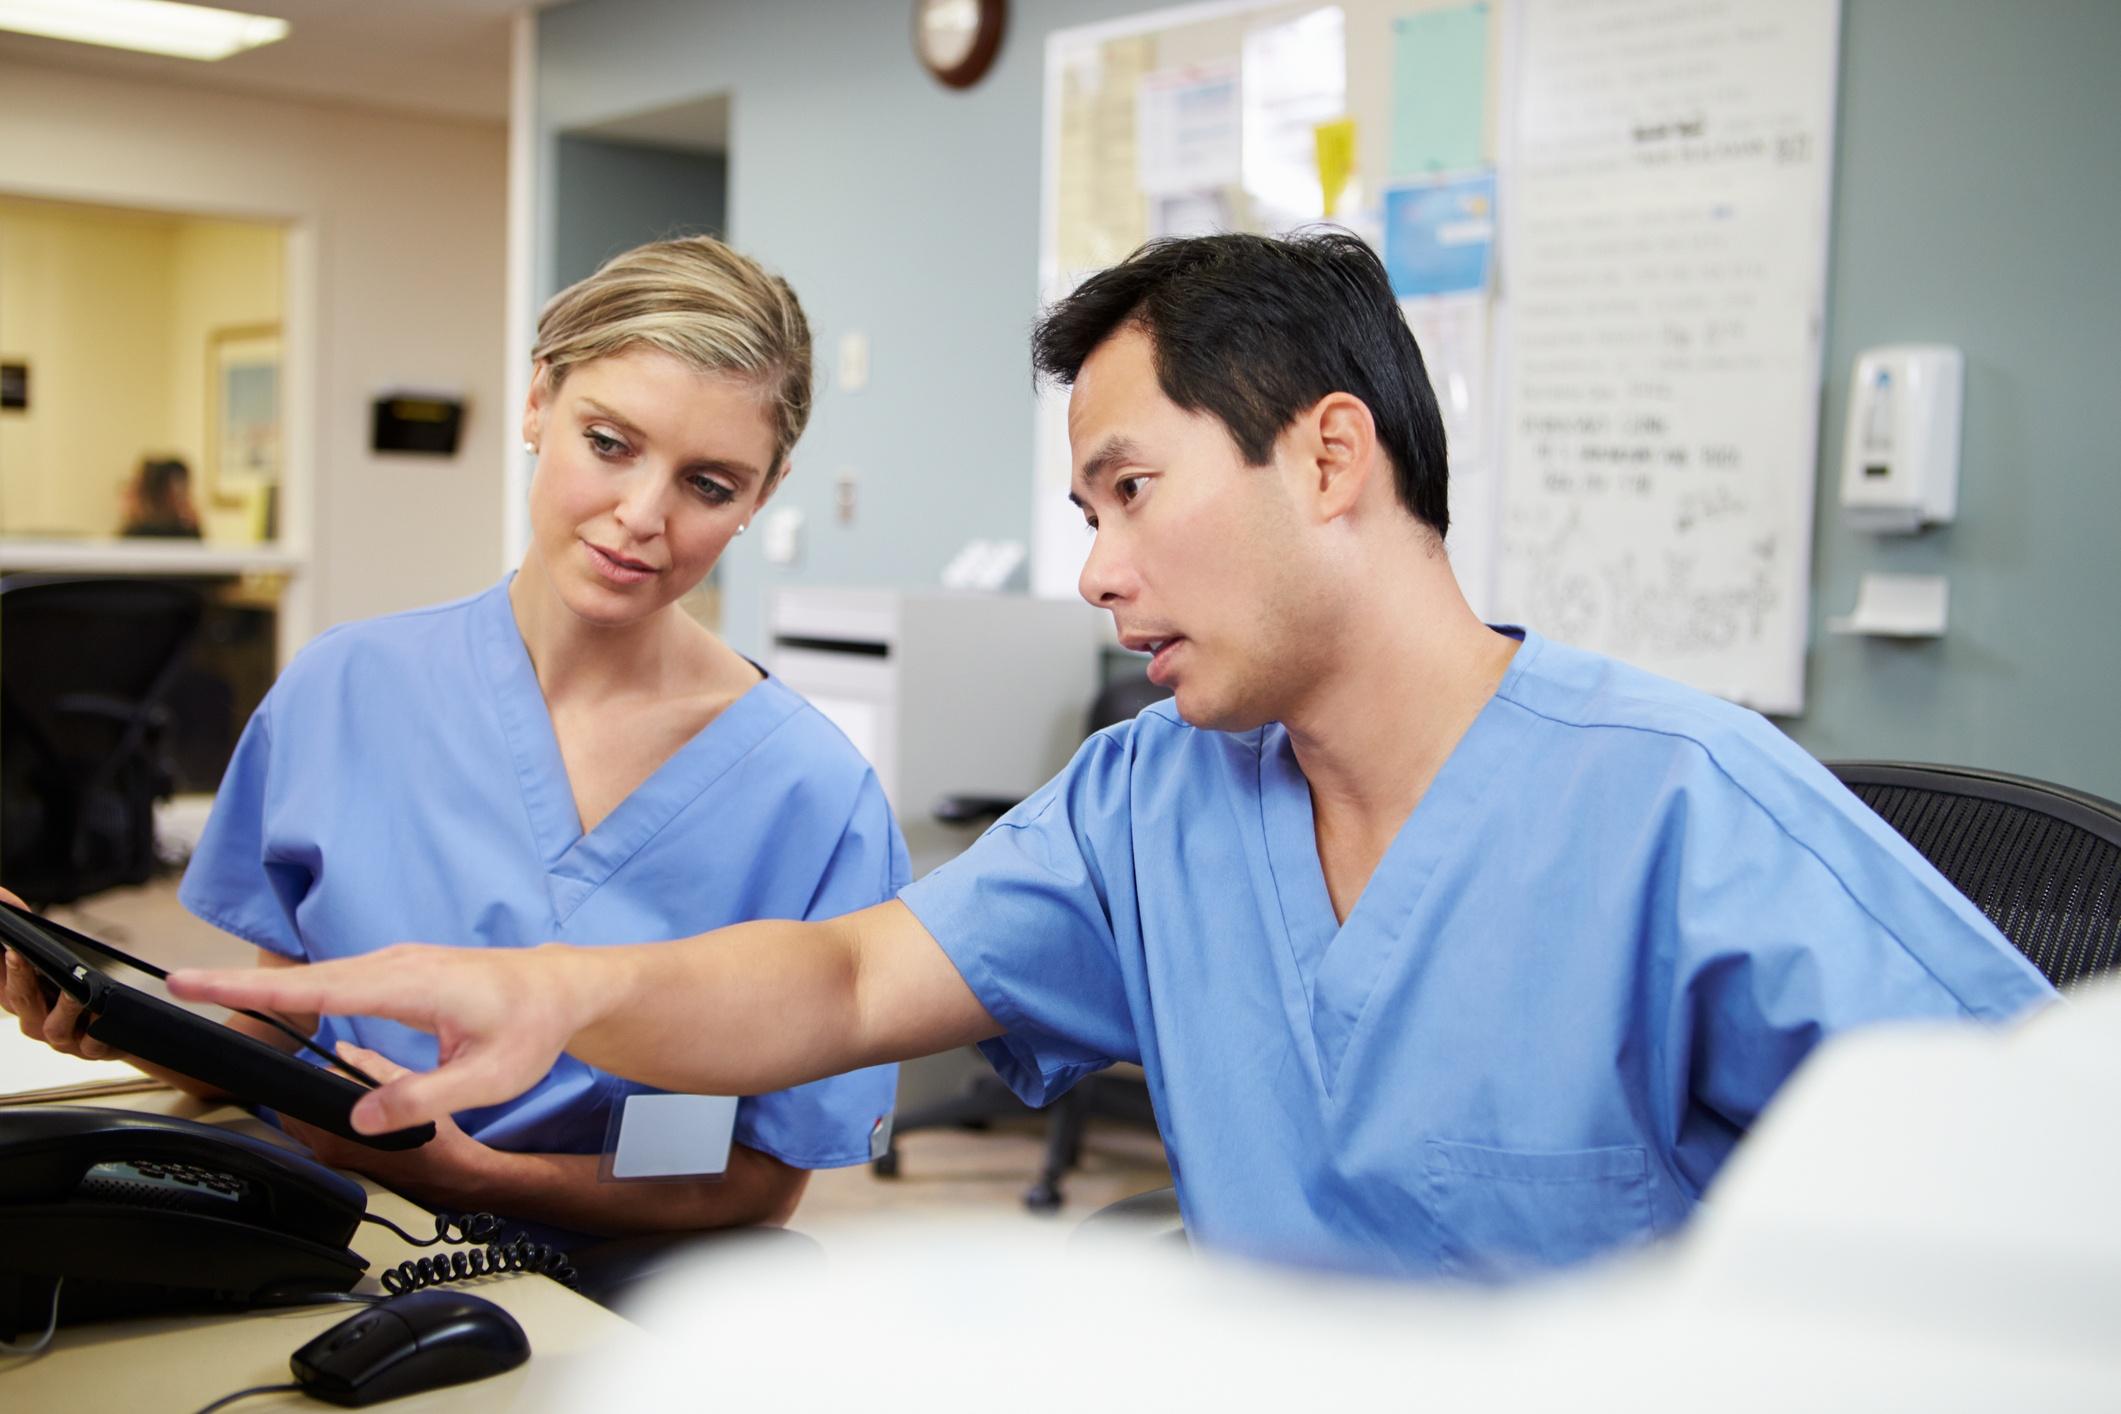 Credentialing, Credentialing Software, Risk Management, Nurse Credentialing